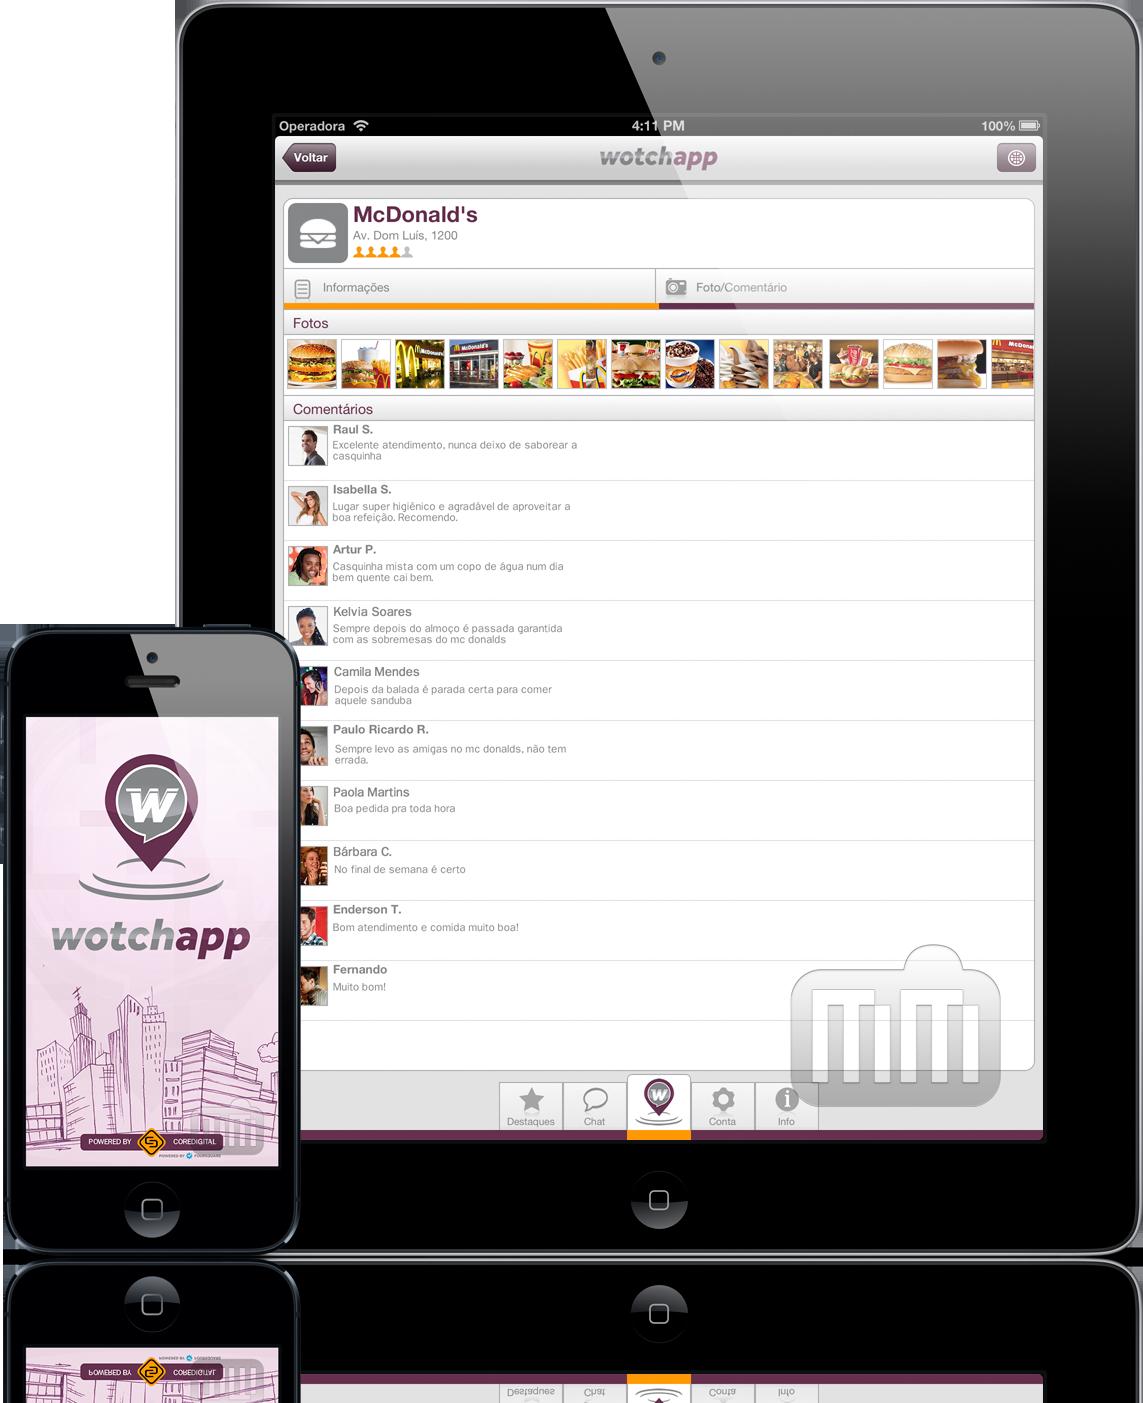 Wotchapp - iPad e iPhone